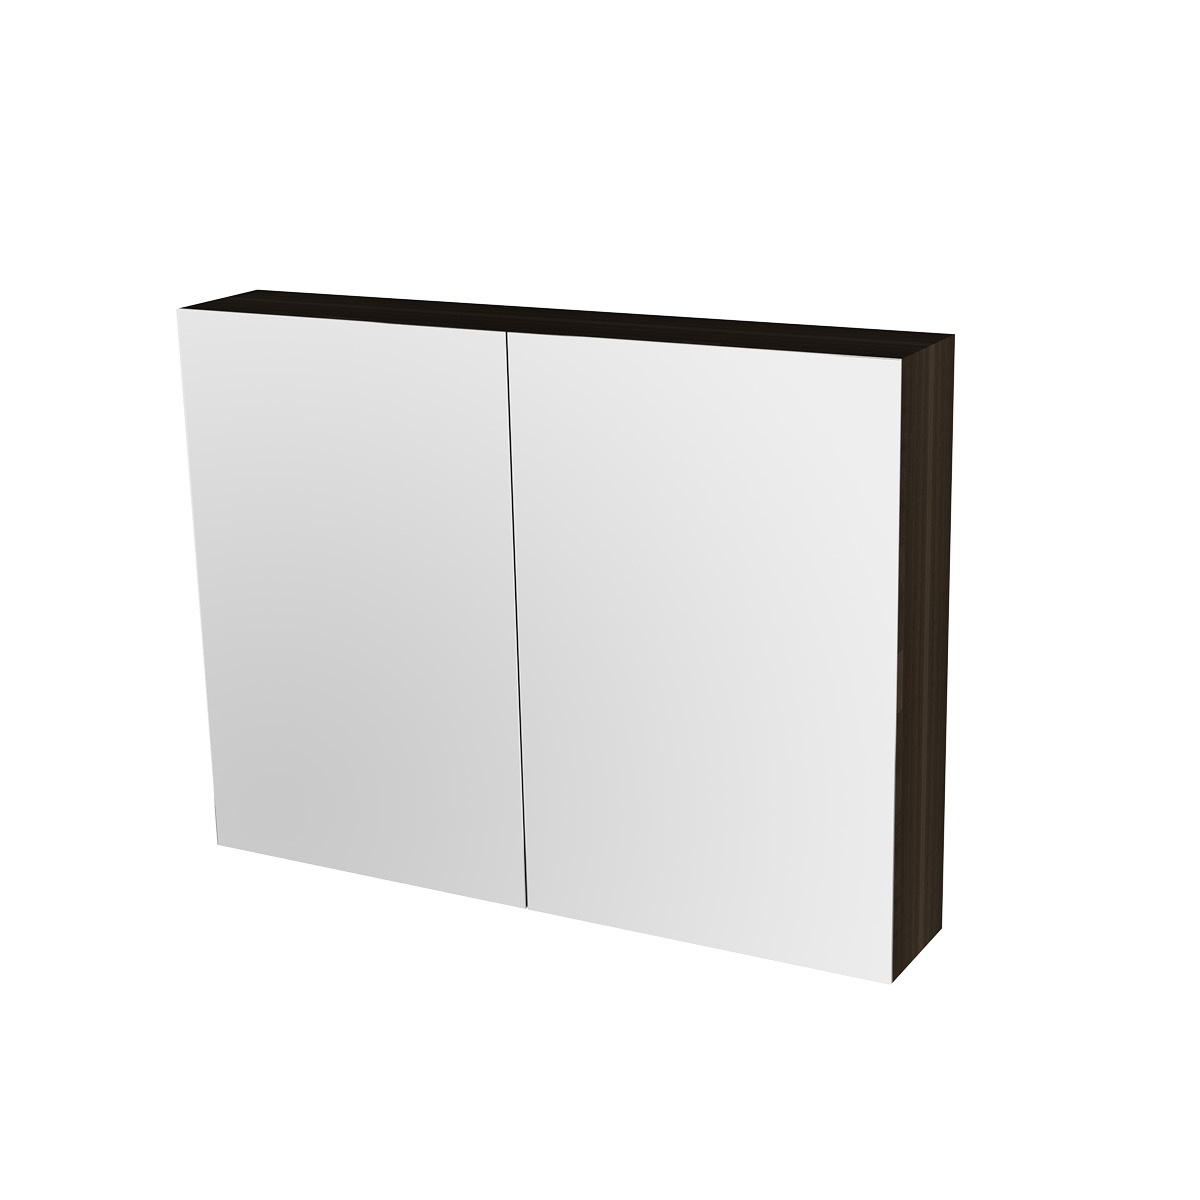 spiegelschrank 80 cm nussbaum badewelt badezimmer m bel. Black Bedroom Furniture Sets. Home Design Ideas